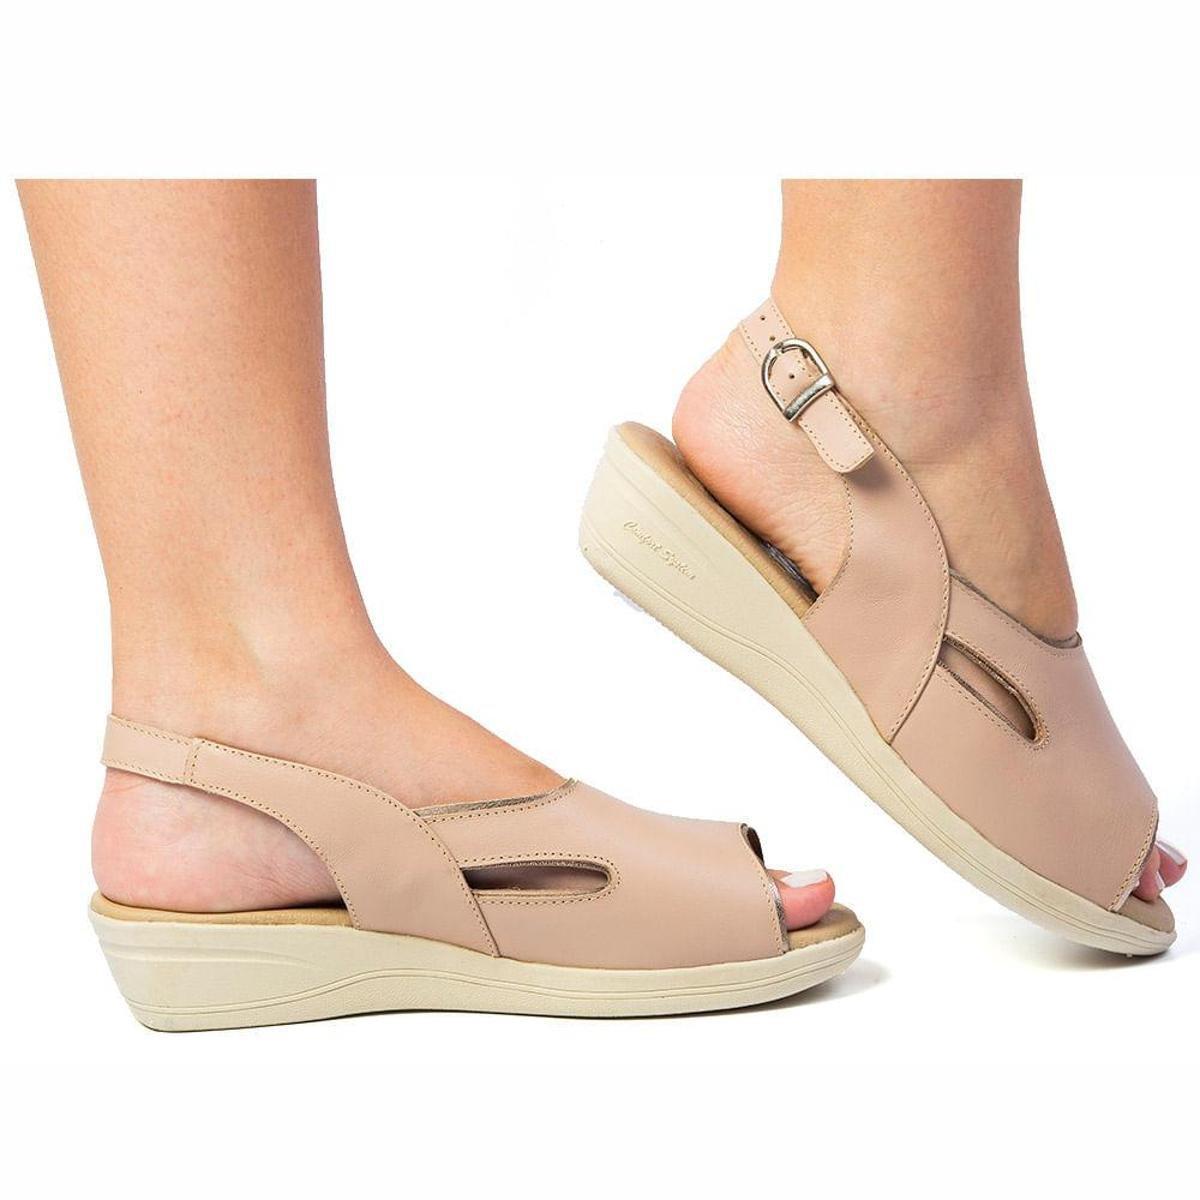 Feminina Anabela em 161 em Doctor Feminina Sandália Doctor 161 Nude Anabela Couro Couro Sandália Shoes anAqgc5